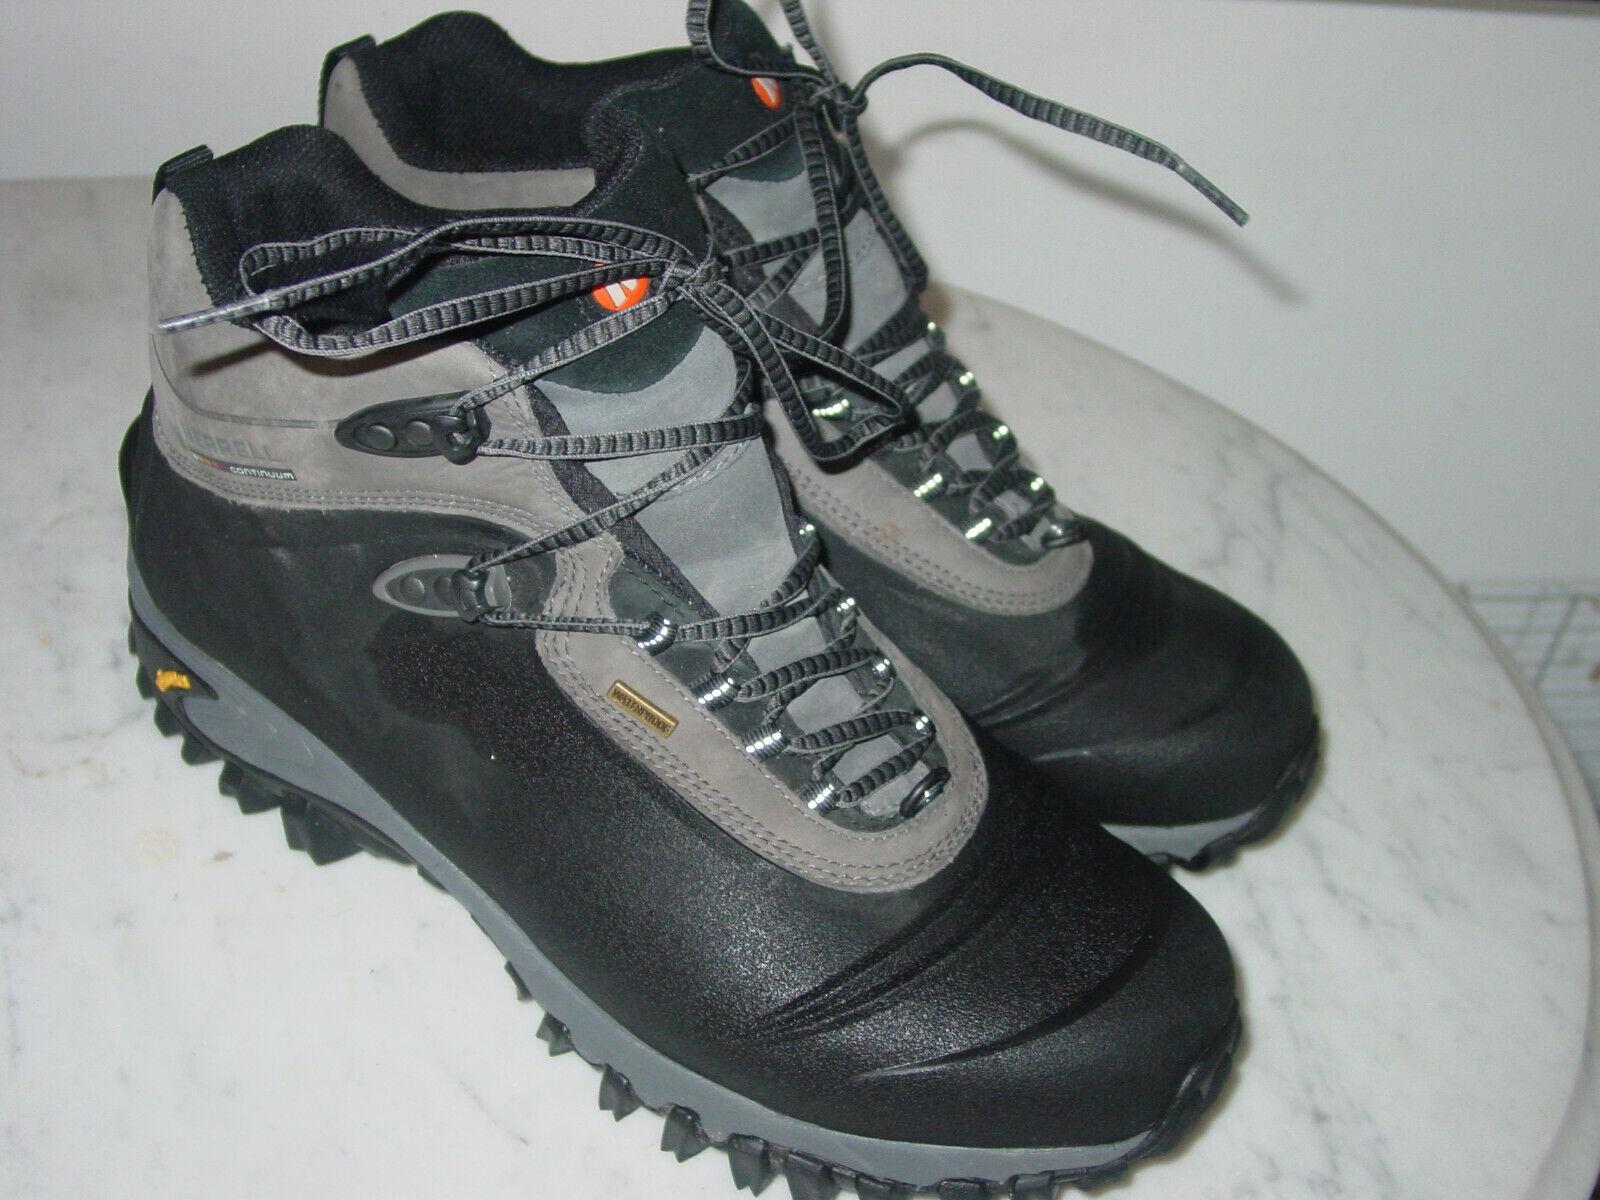 Para Hombre Merrell Thermo 6  200G Negro J82727 Impermeable botas De Invierno